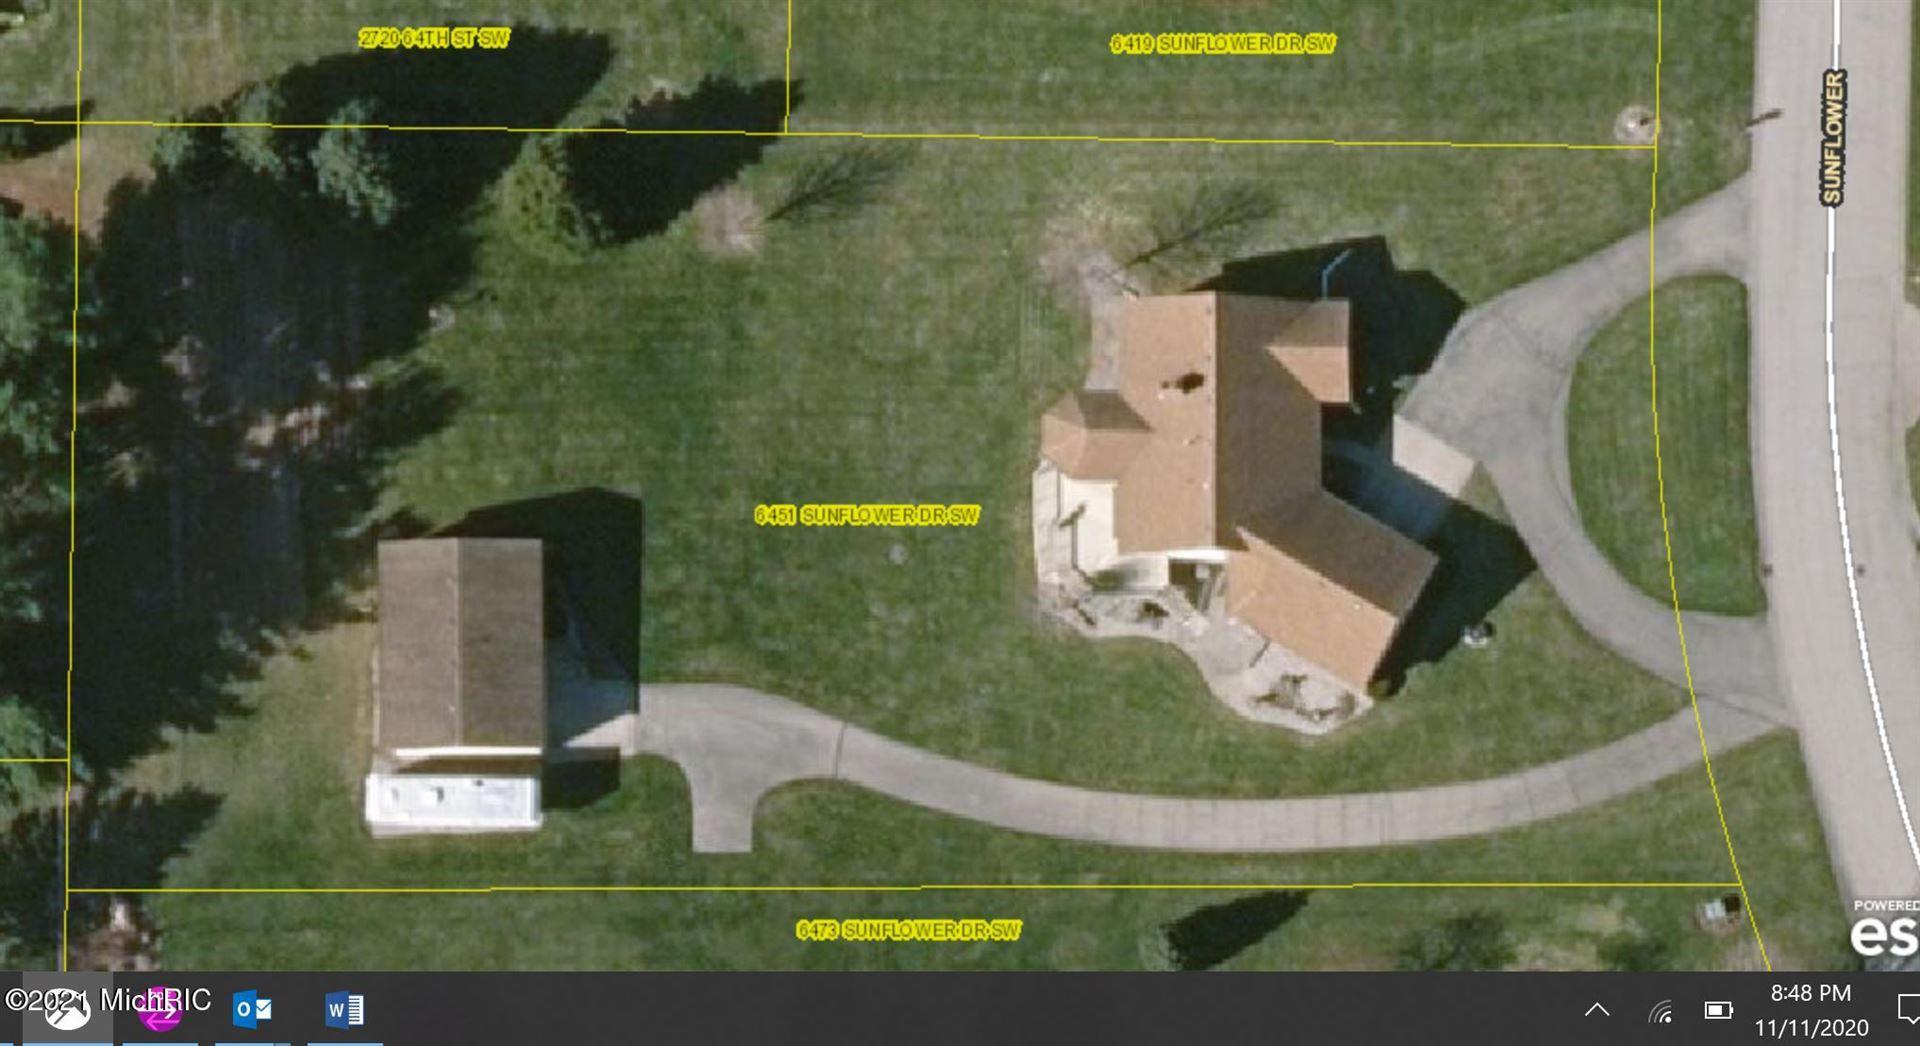 6451 Sunflower Drive SW, Byron Center, MI 49315 - MLS#: 21001327